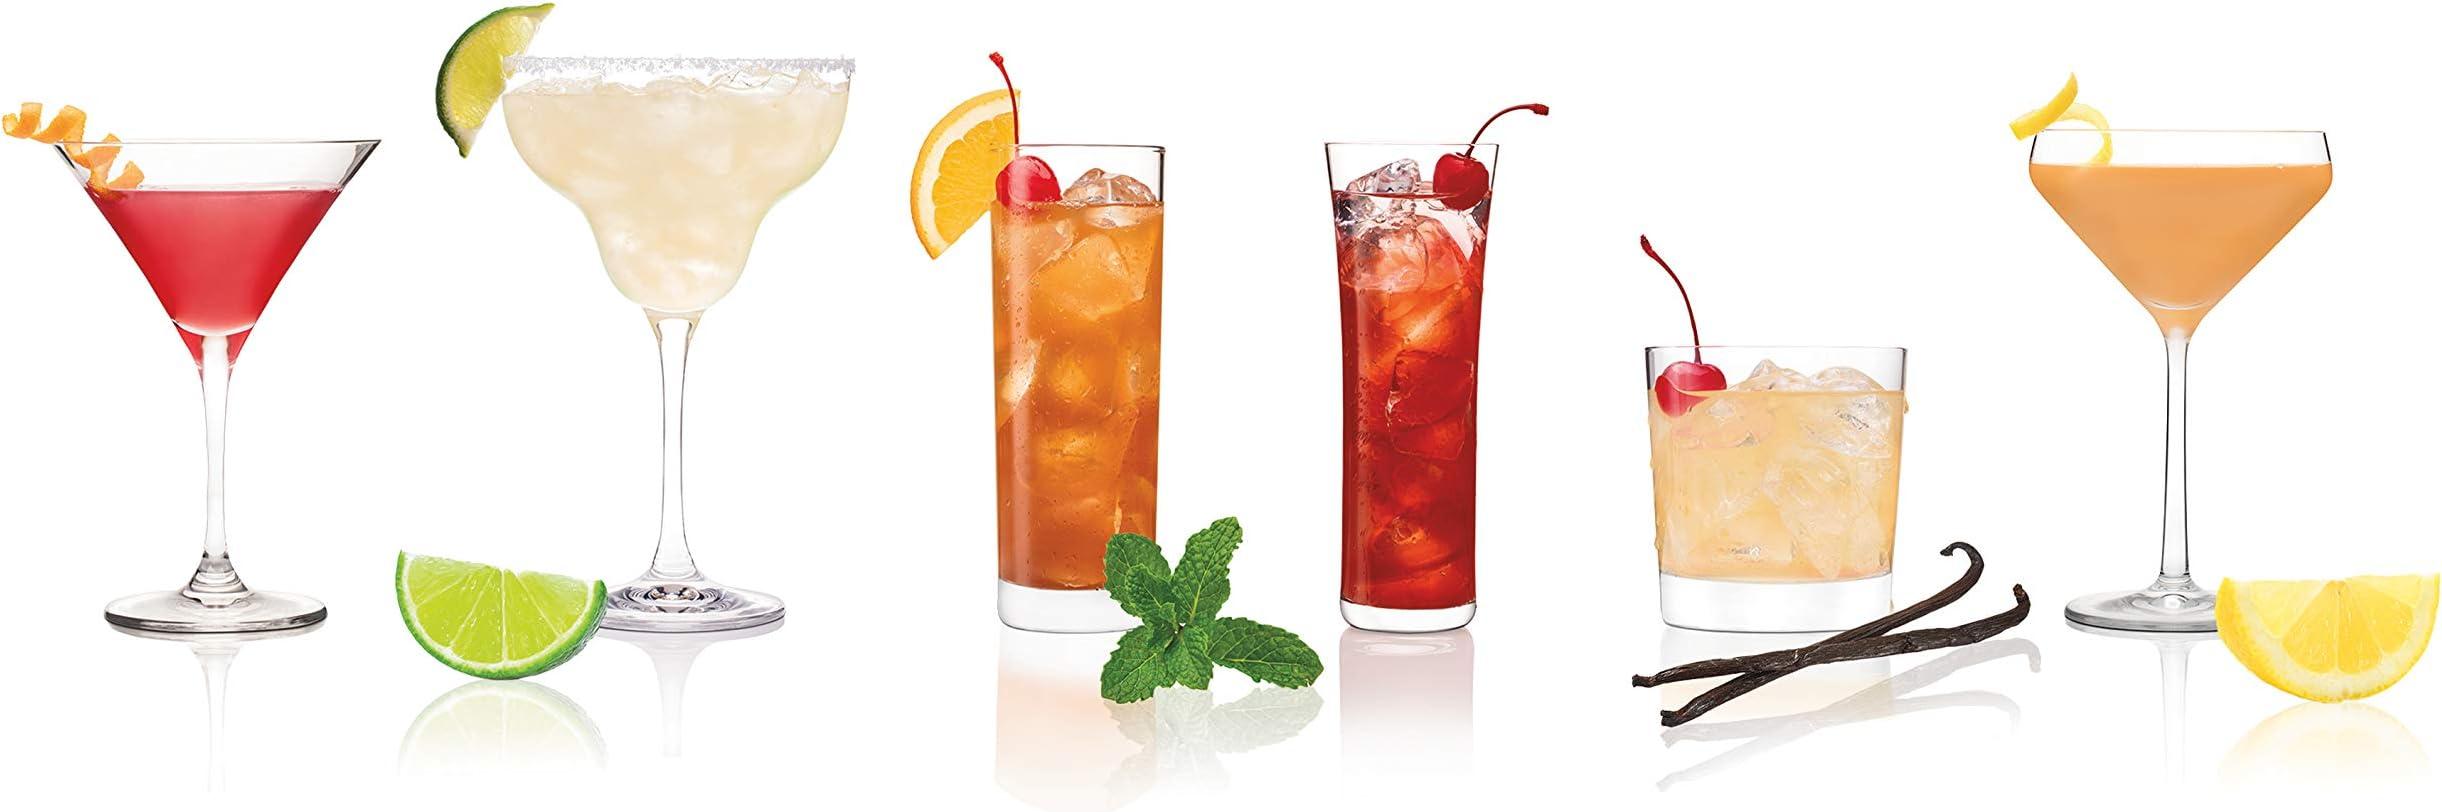 Bartesian Premium Cocktail and Margarita Machine 1